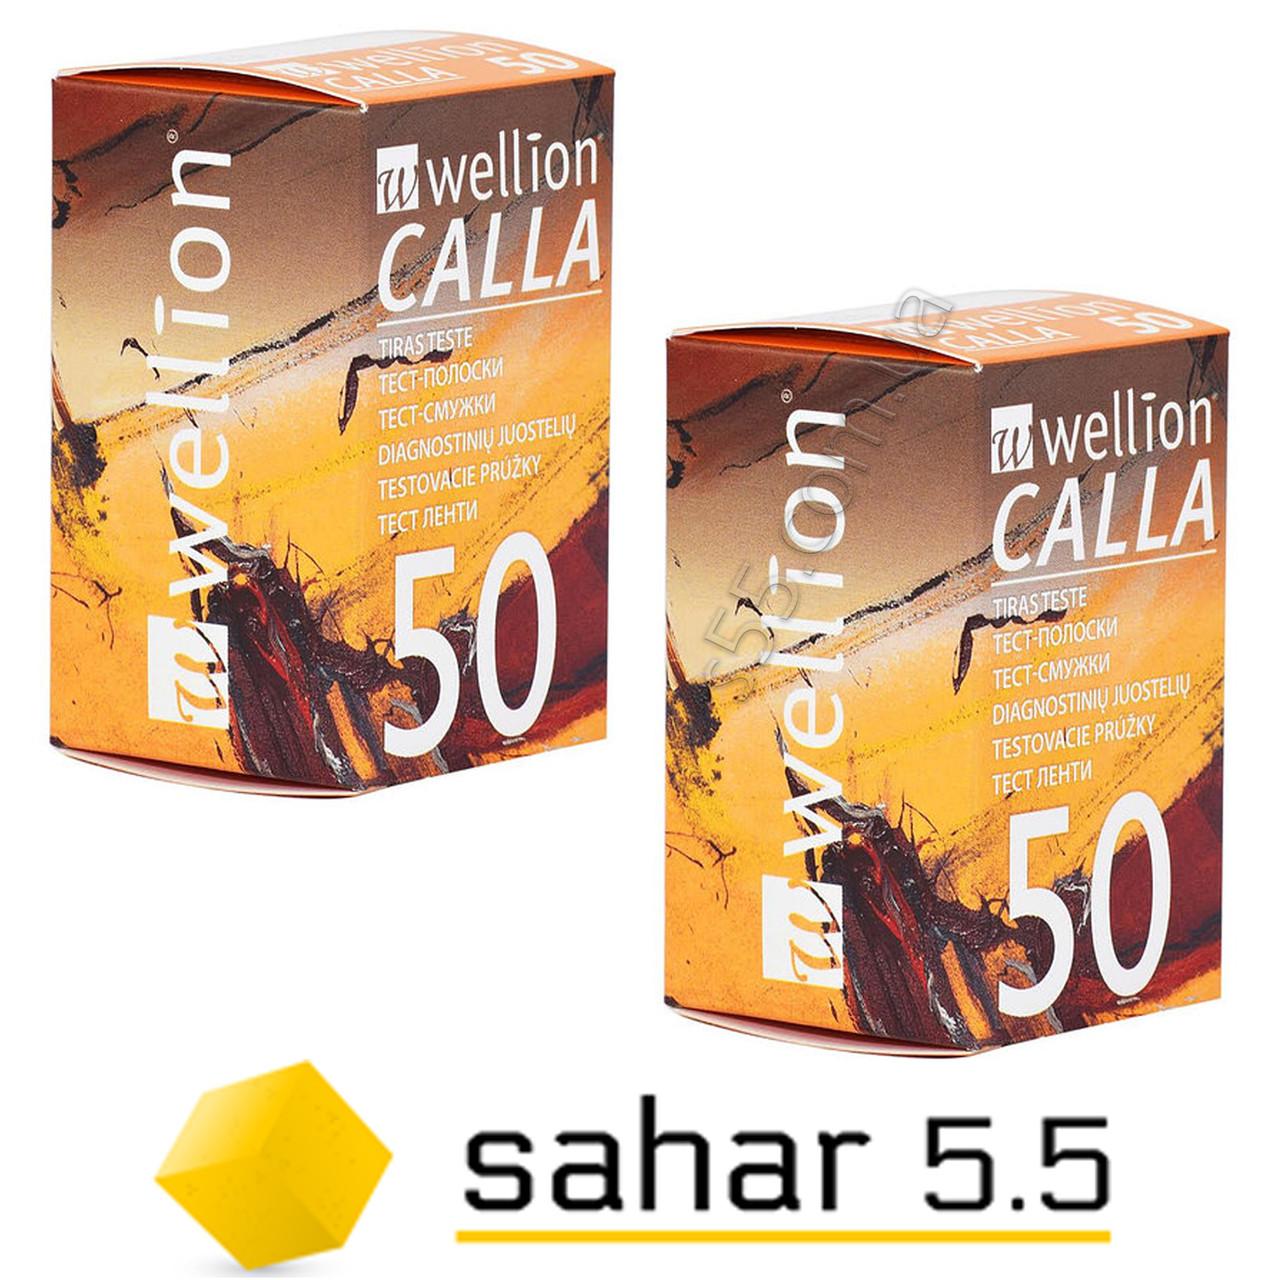 Тест полоски Веллион Калла 2уп. по 50шт - Wellion Calla